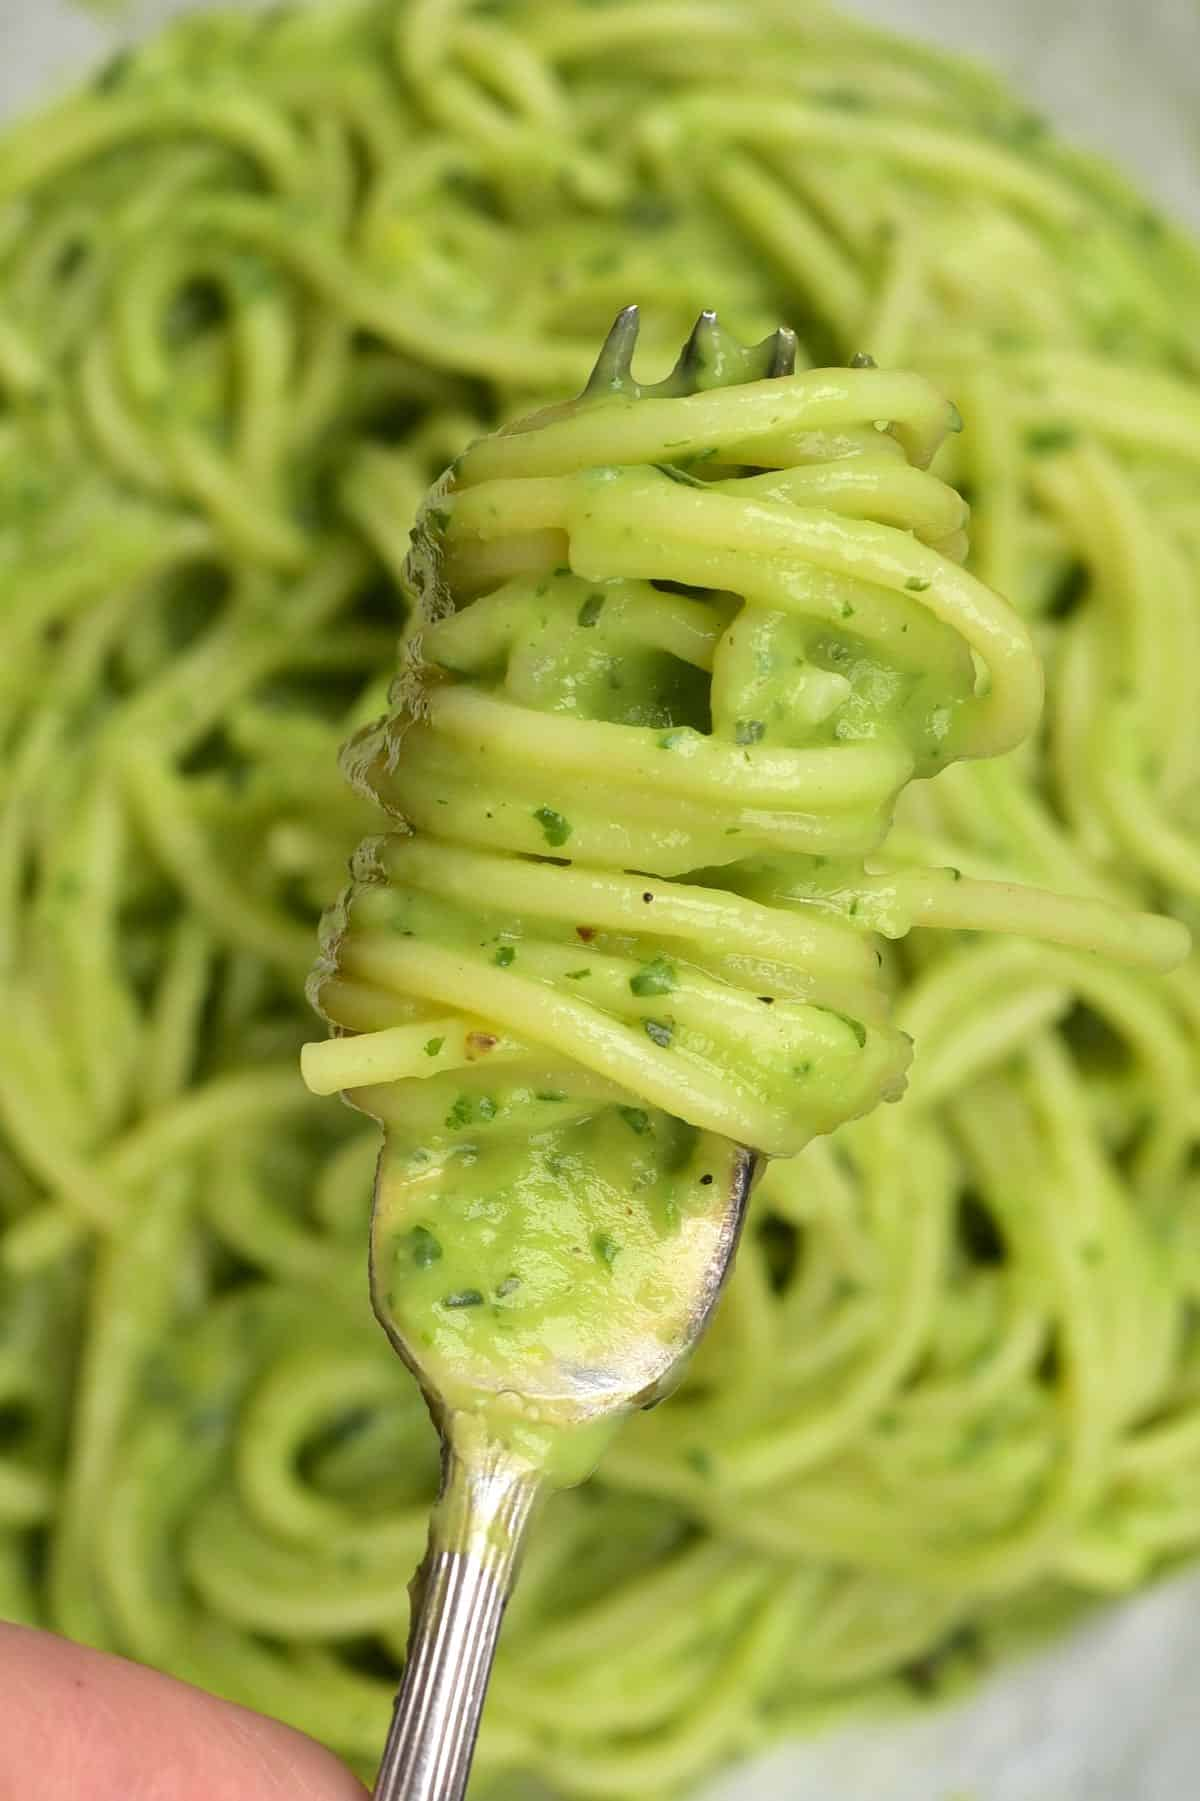 A forkful of avocado pasta